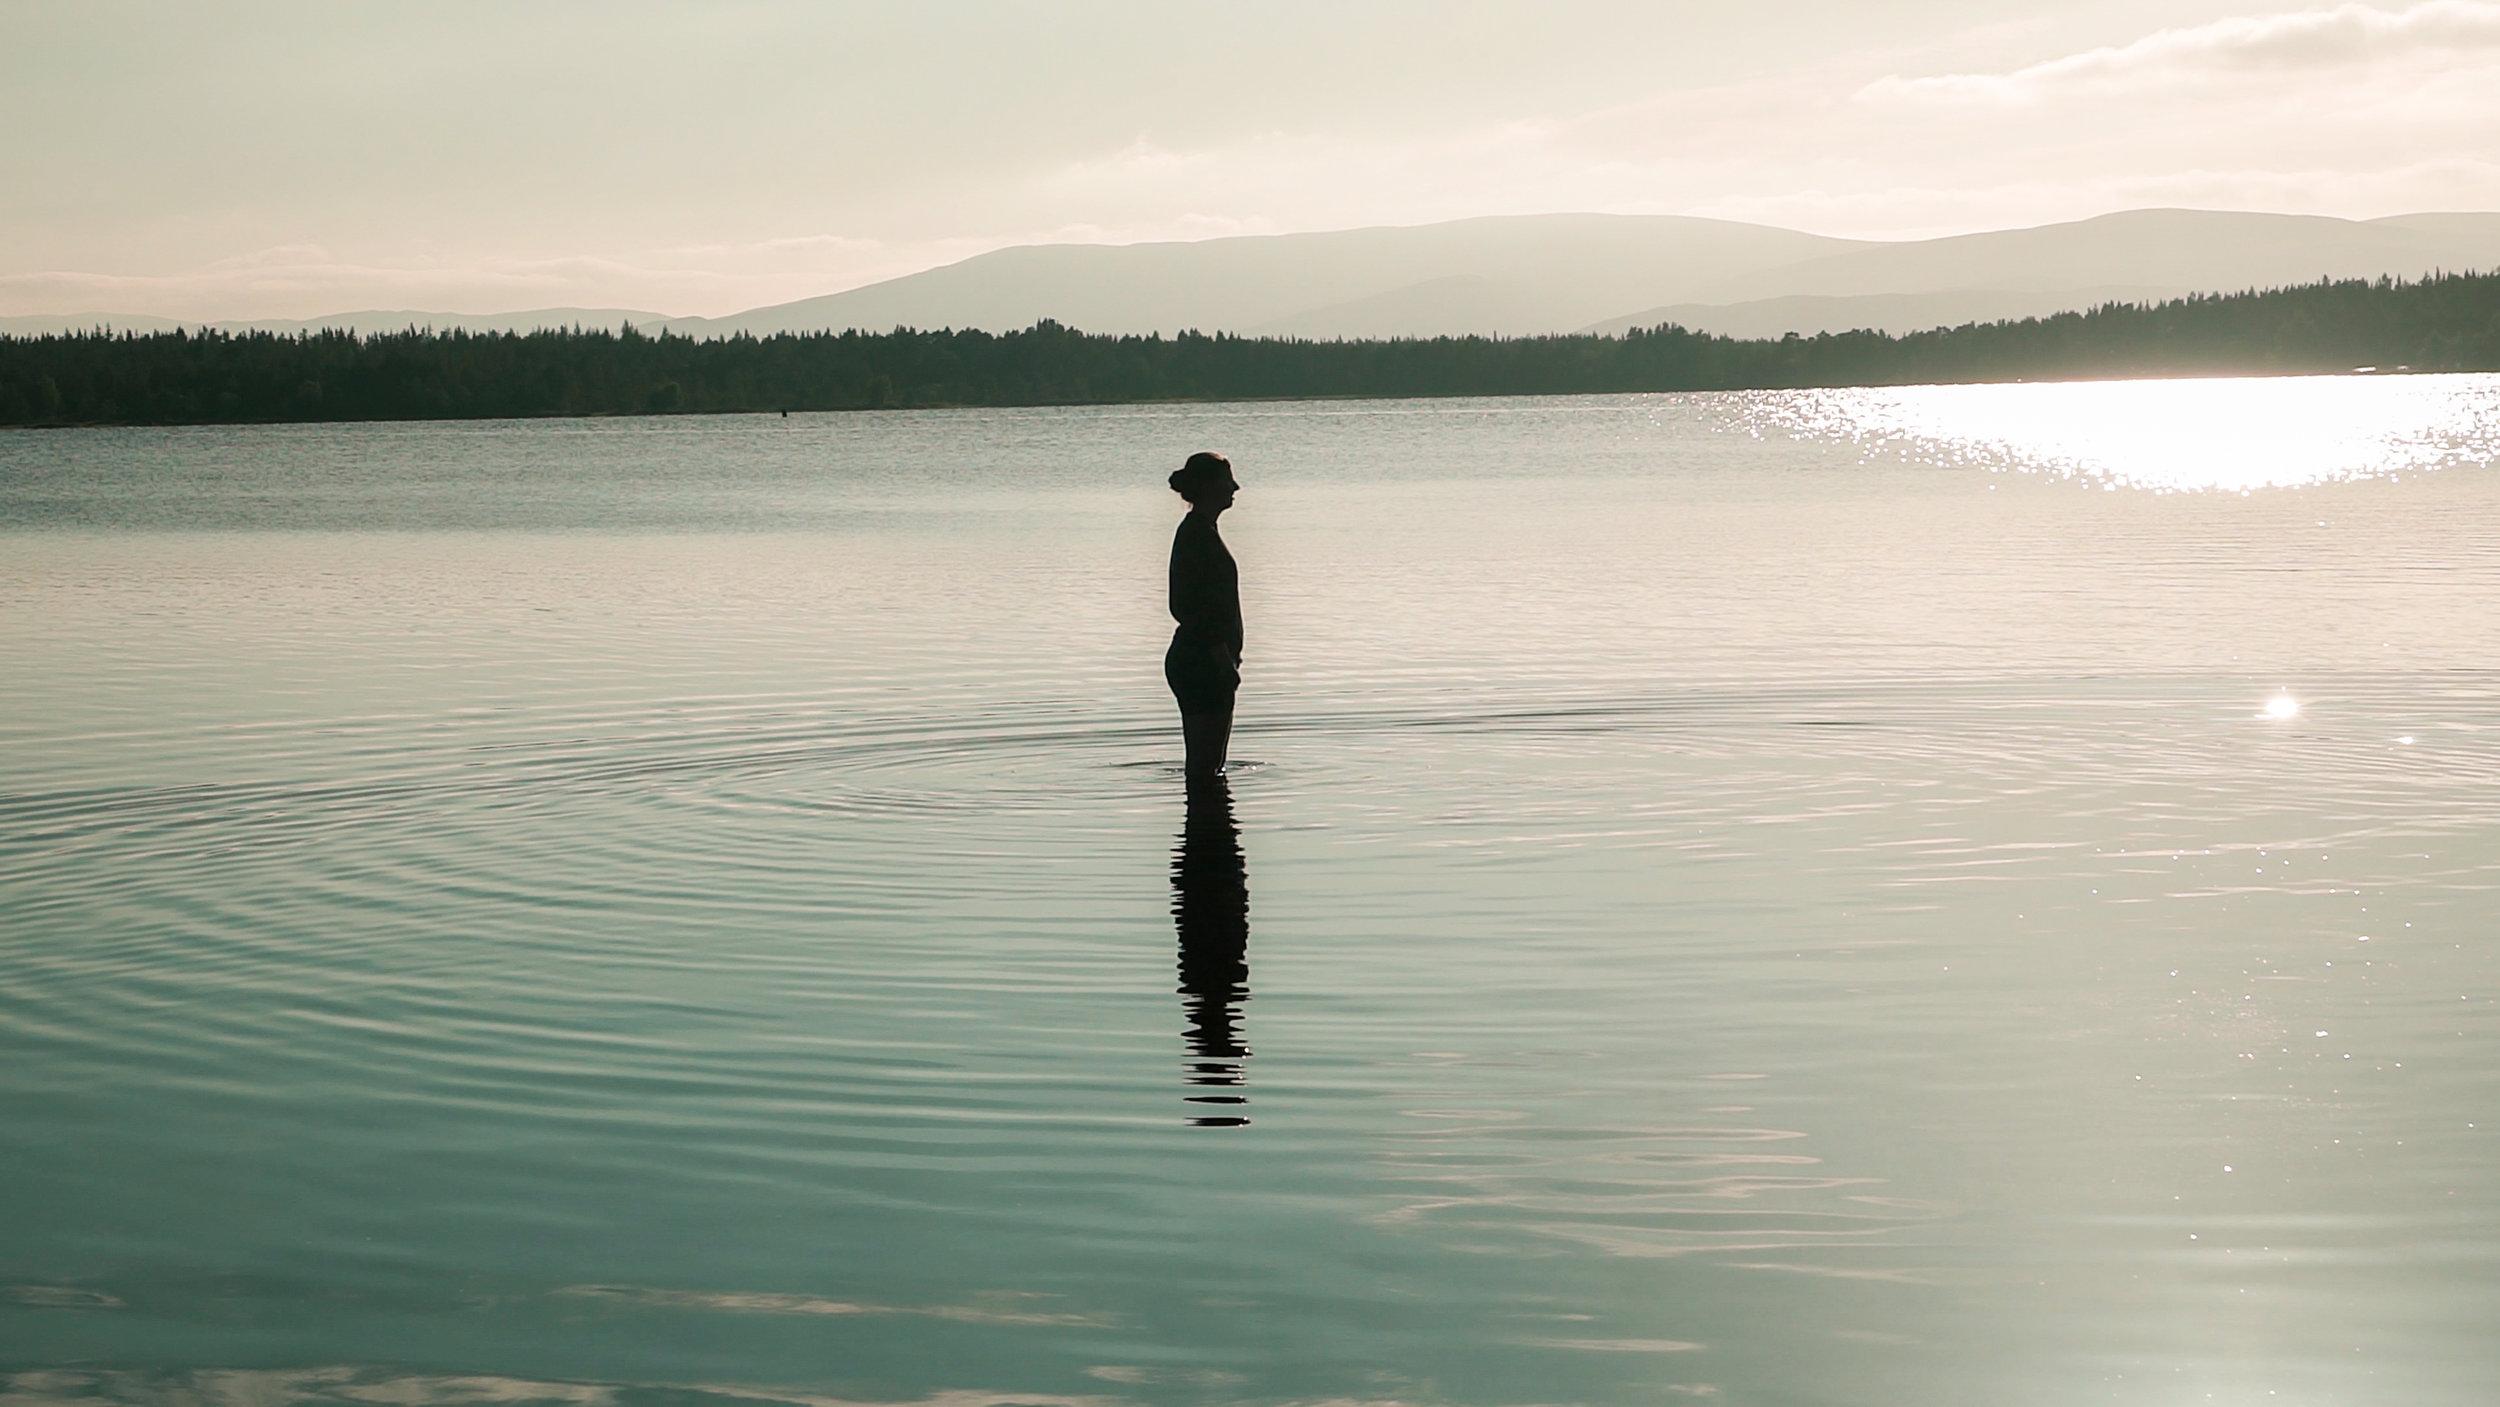 Videography work short short Scottish film